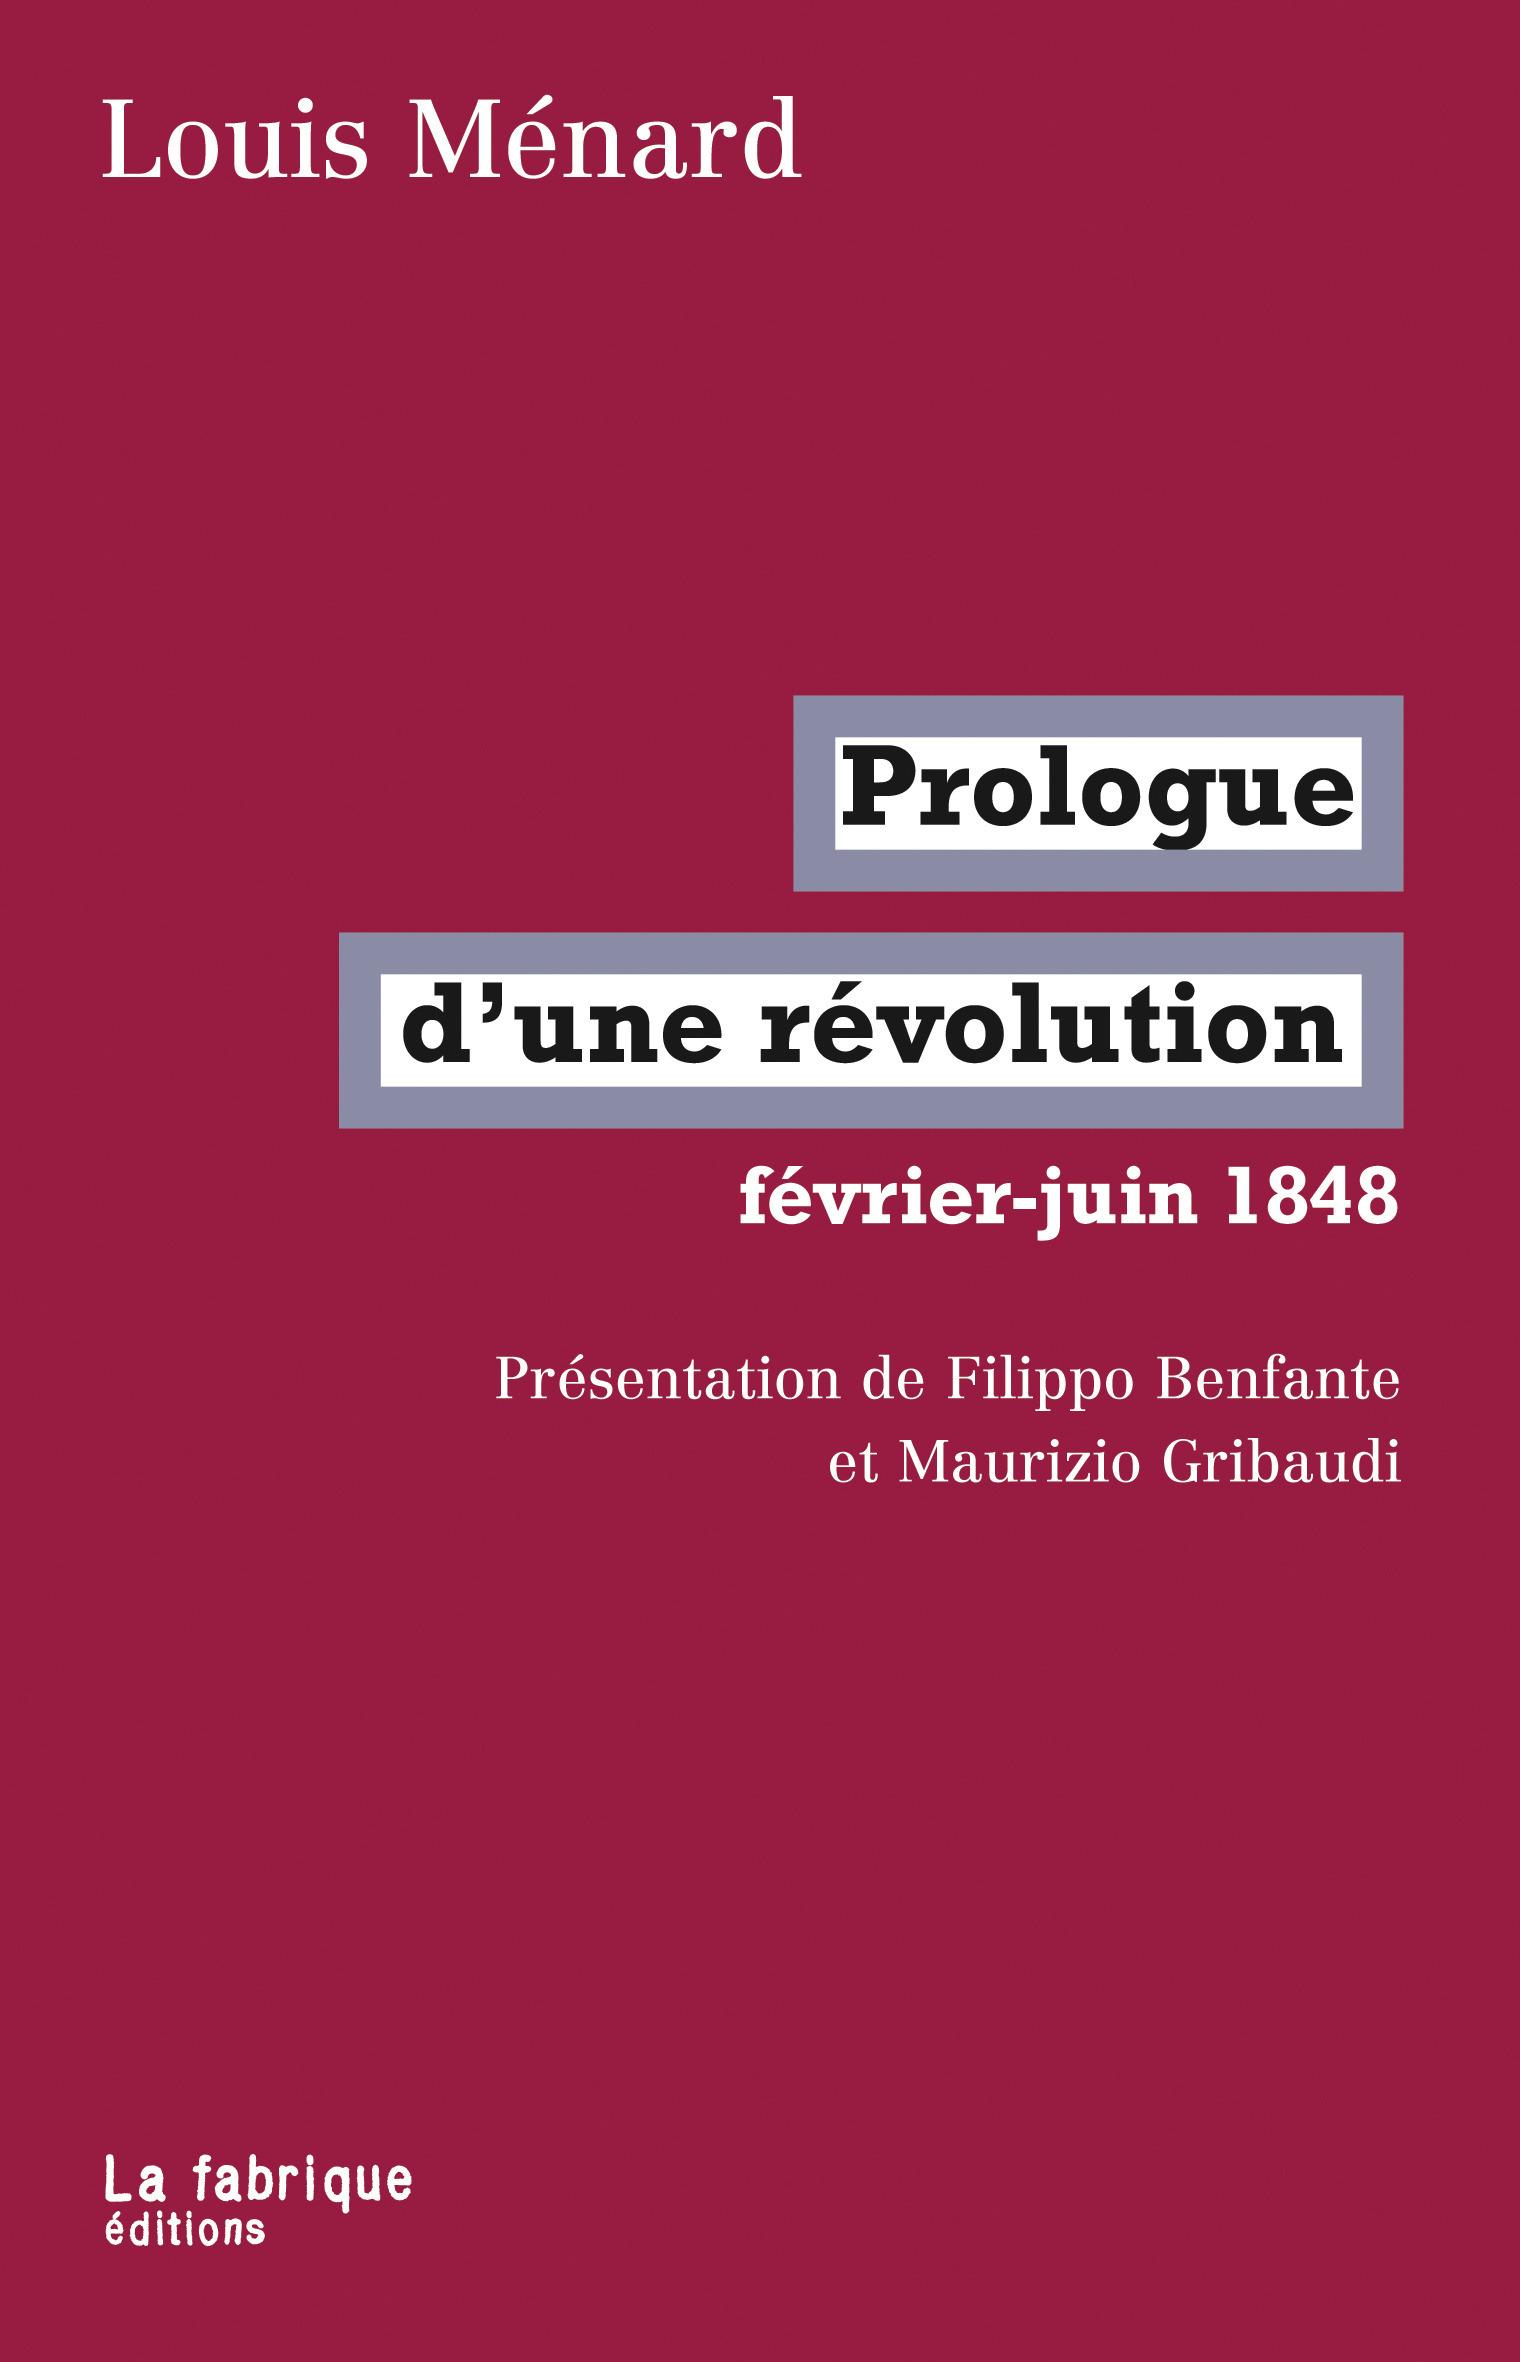 Louis Ménard Prologue d'une révolution